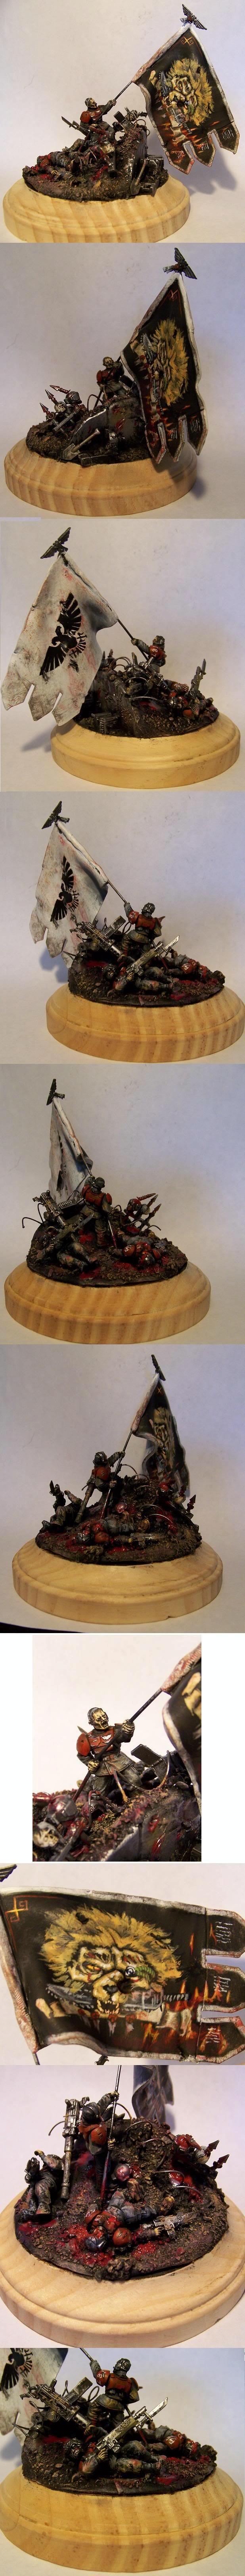 Diorama, Imperial Guard, Standard Bearer, Warhammer 40,000